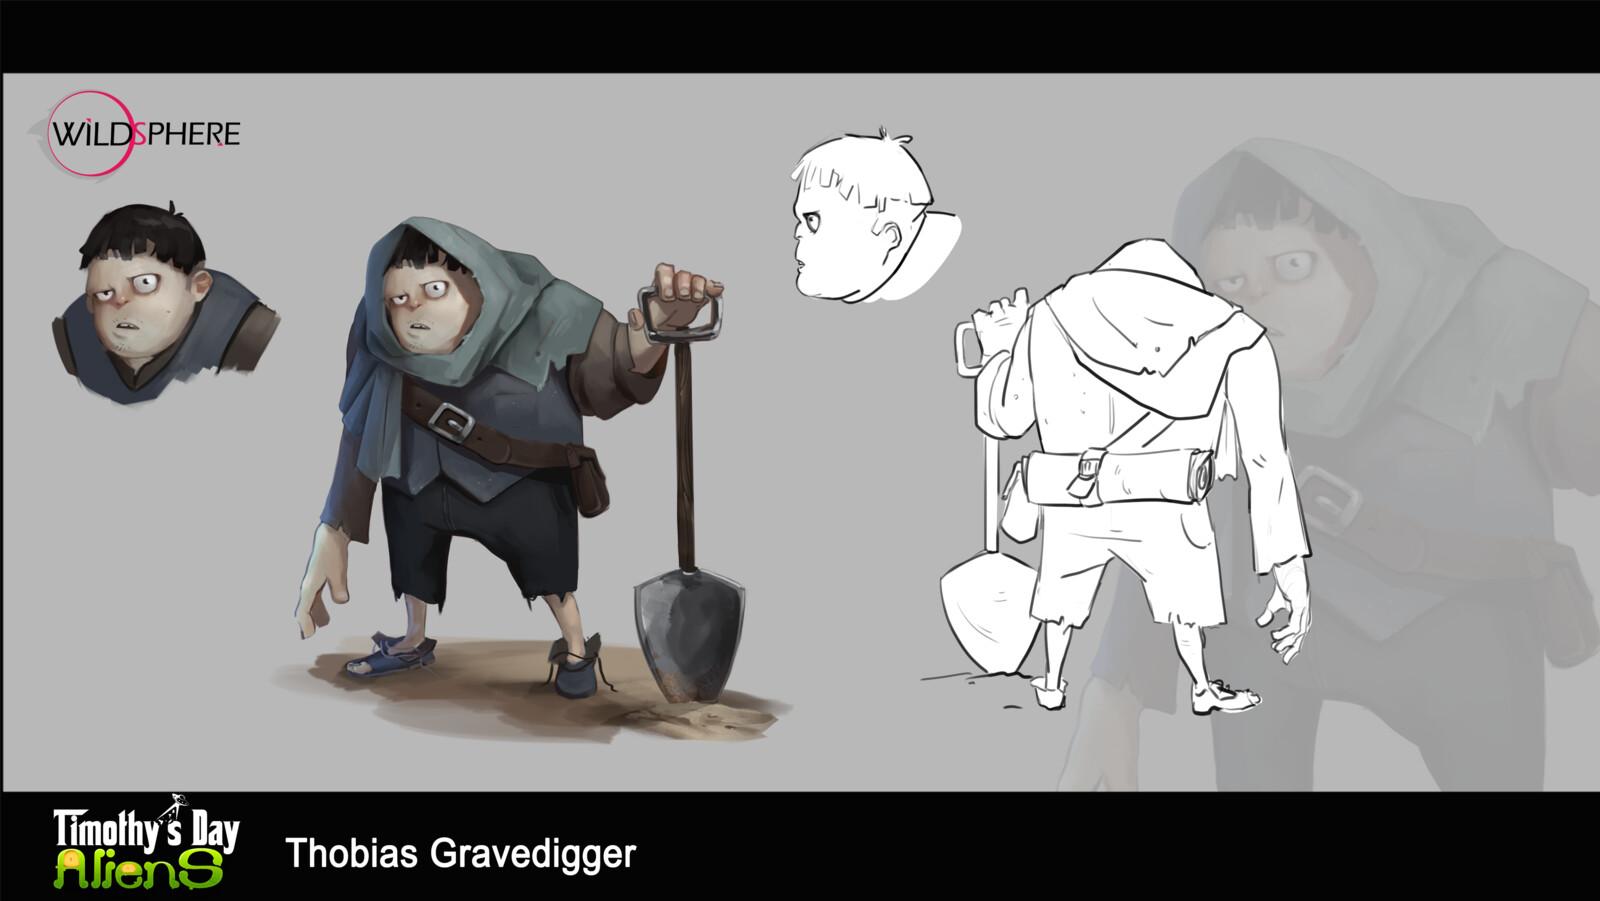 Thobias Gravedigger